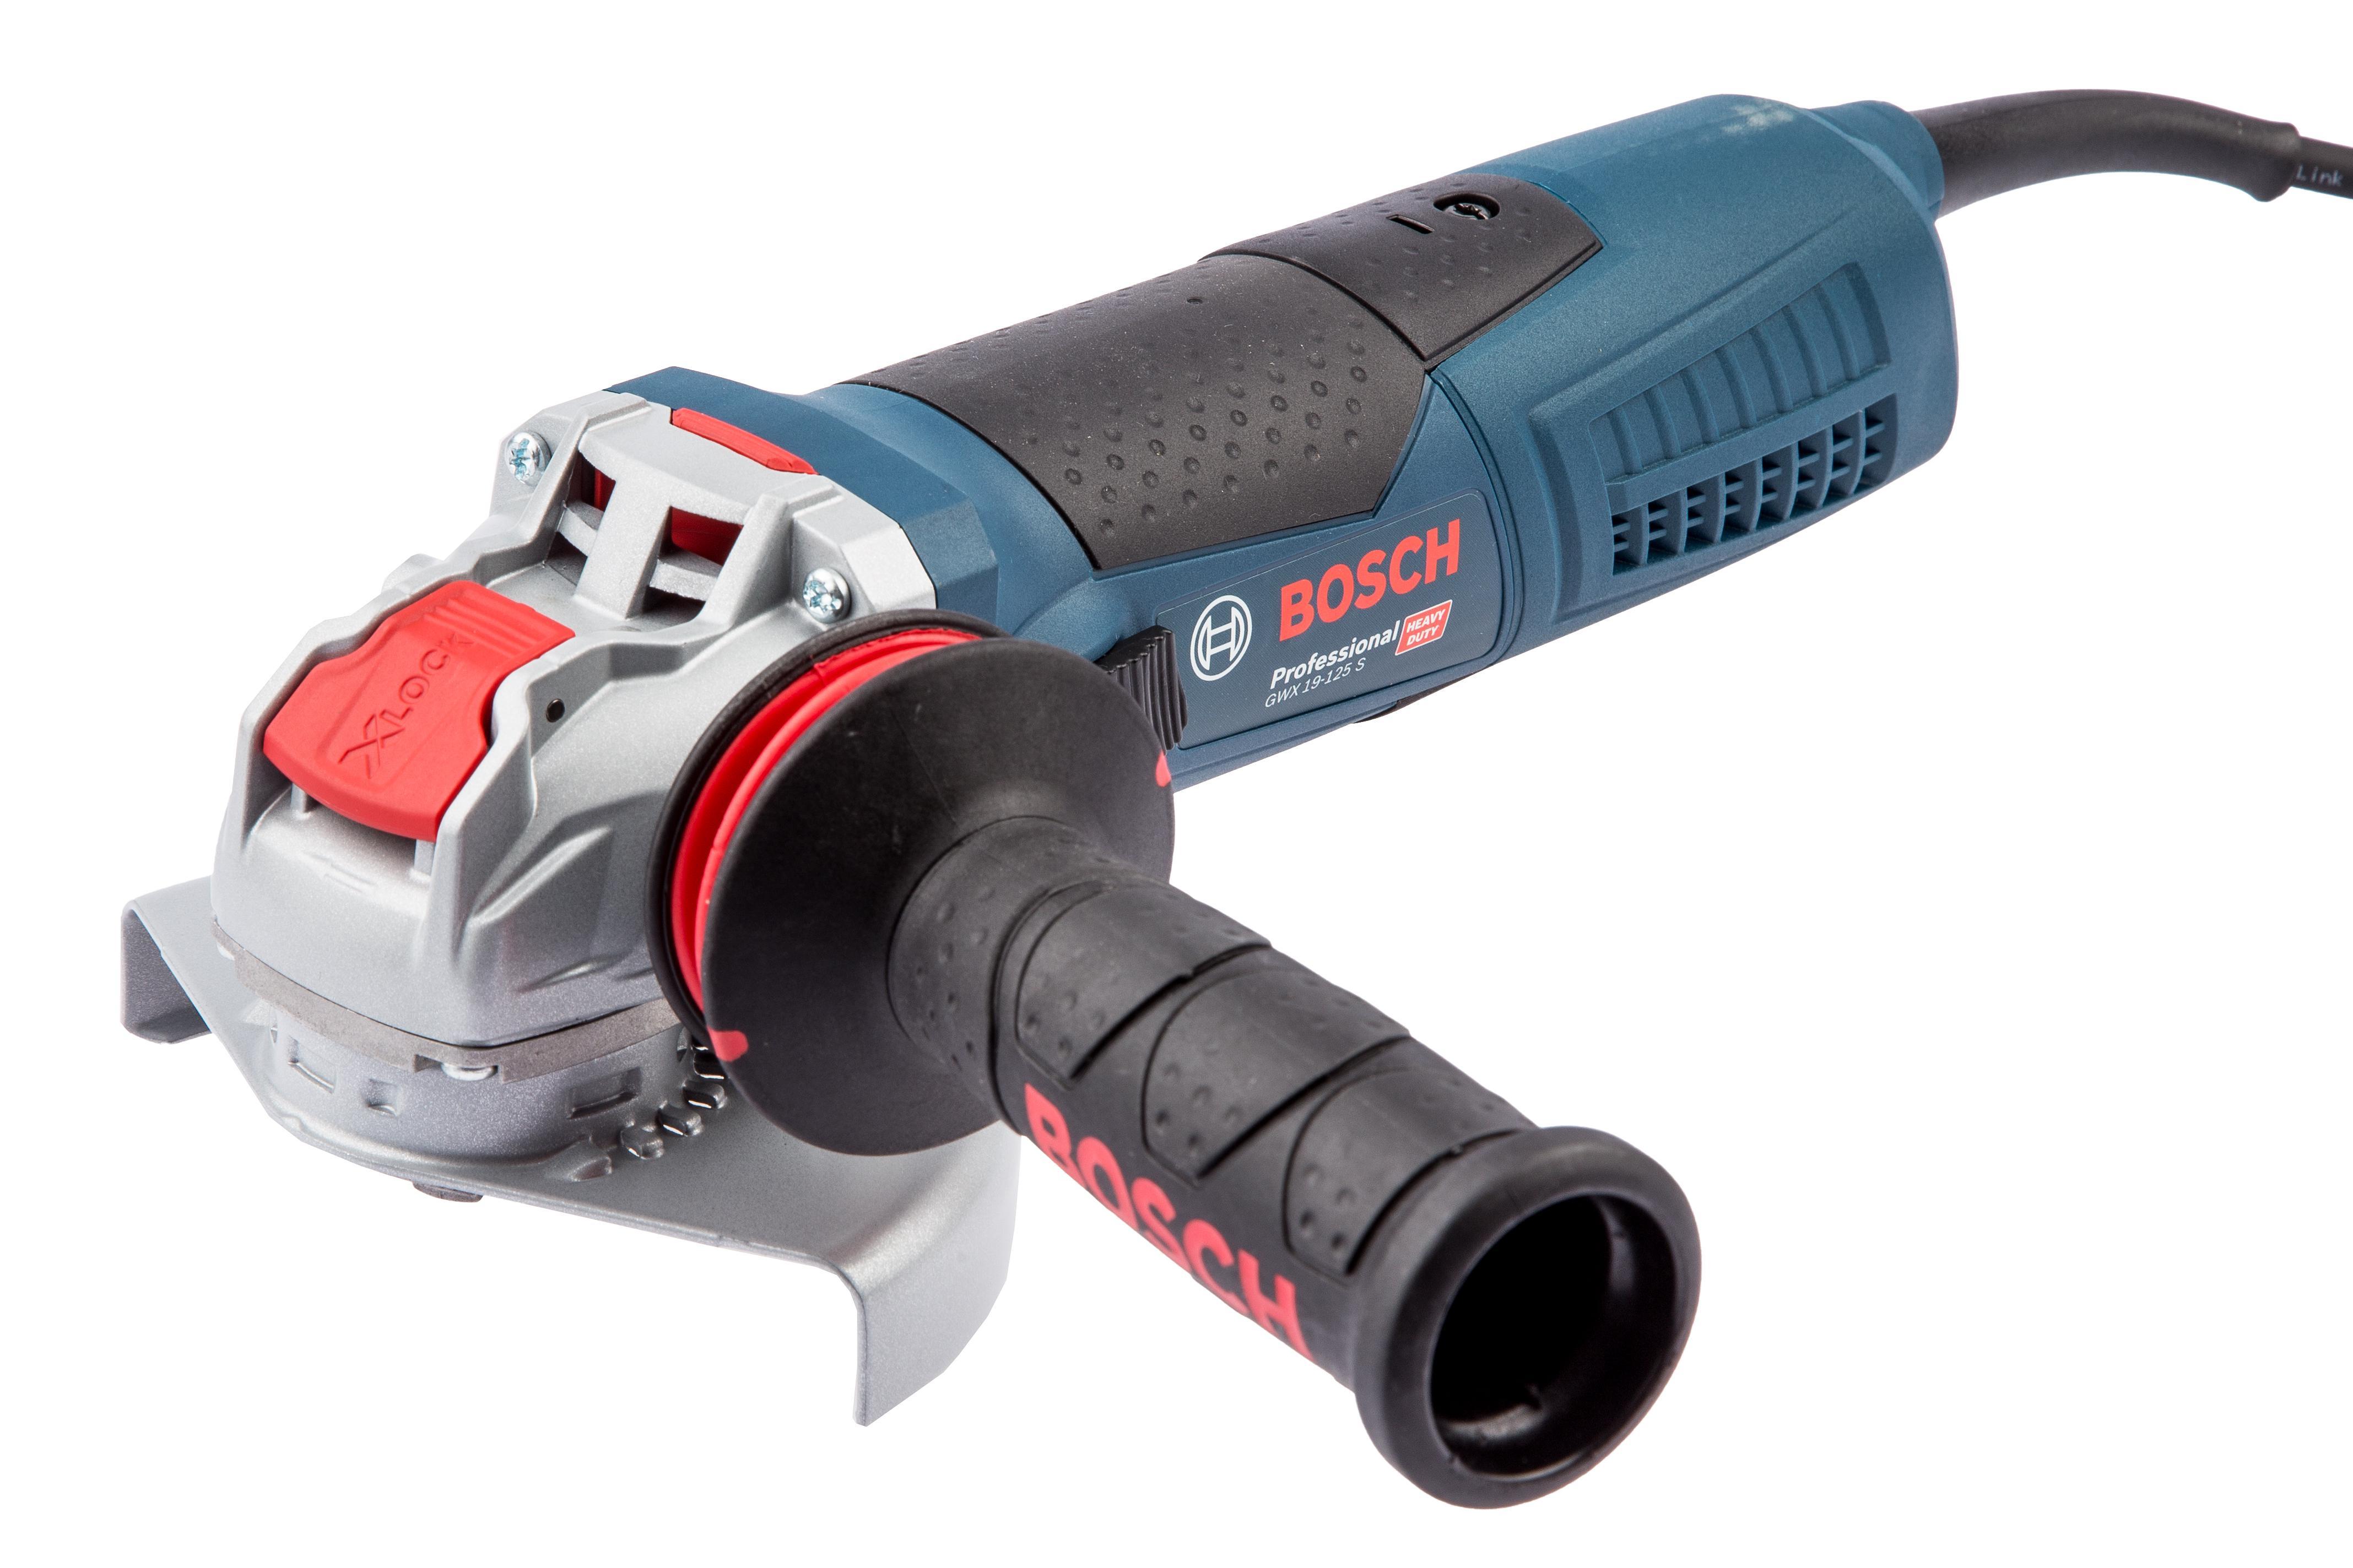 УШМ (болгарка) Bosch Gwx 19-125 s (06017c8002) x-lock